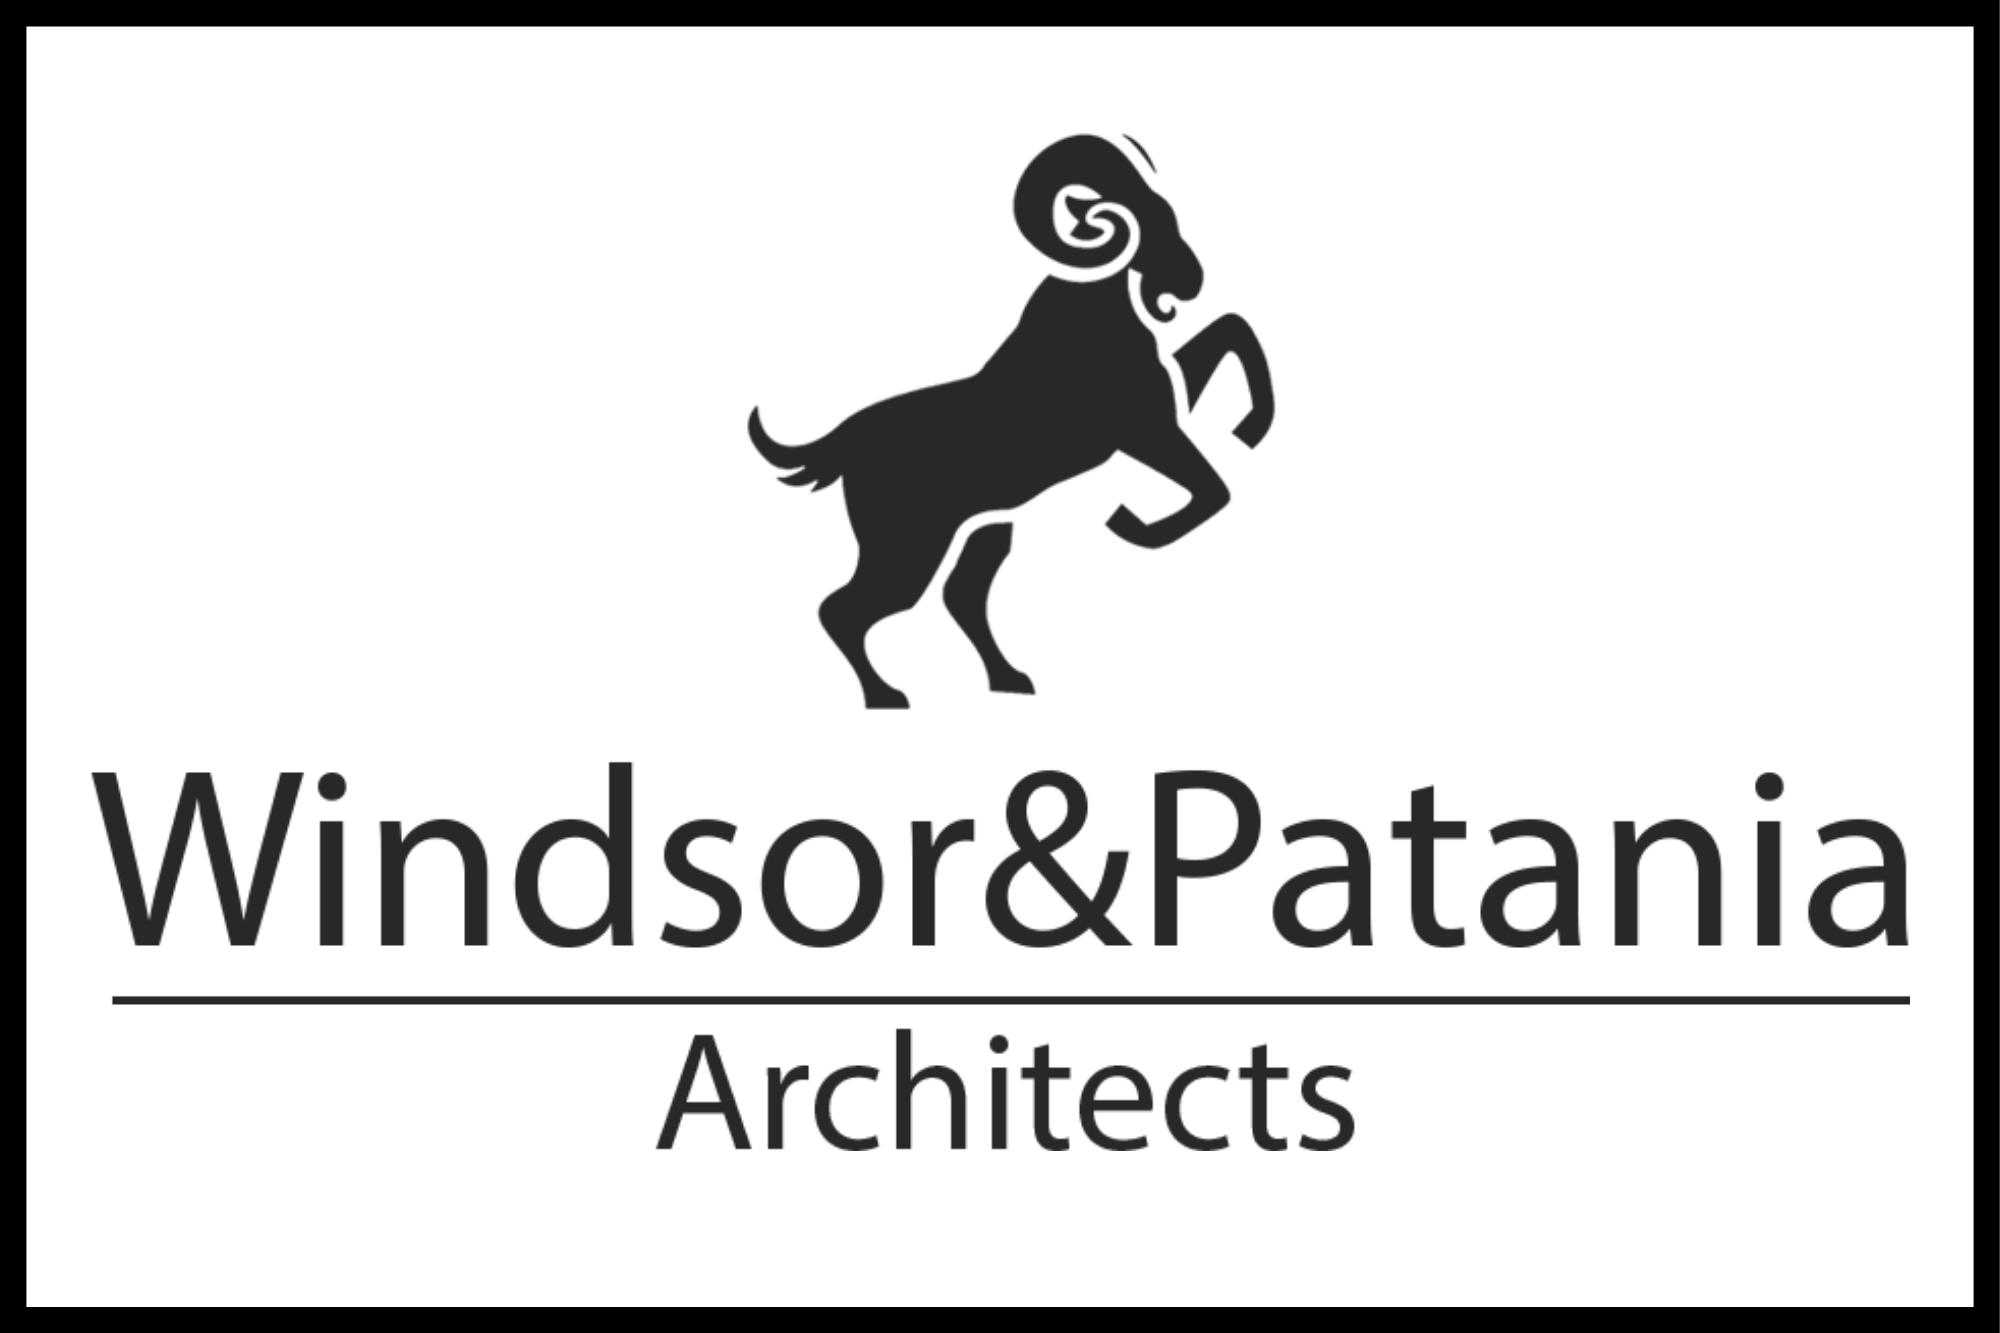 Windsor Patania HMO Architects